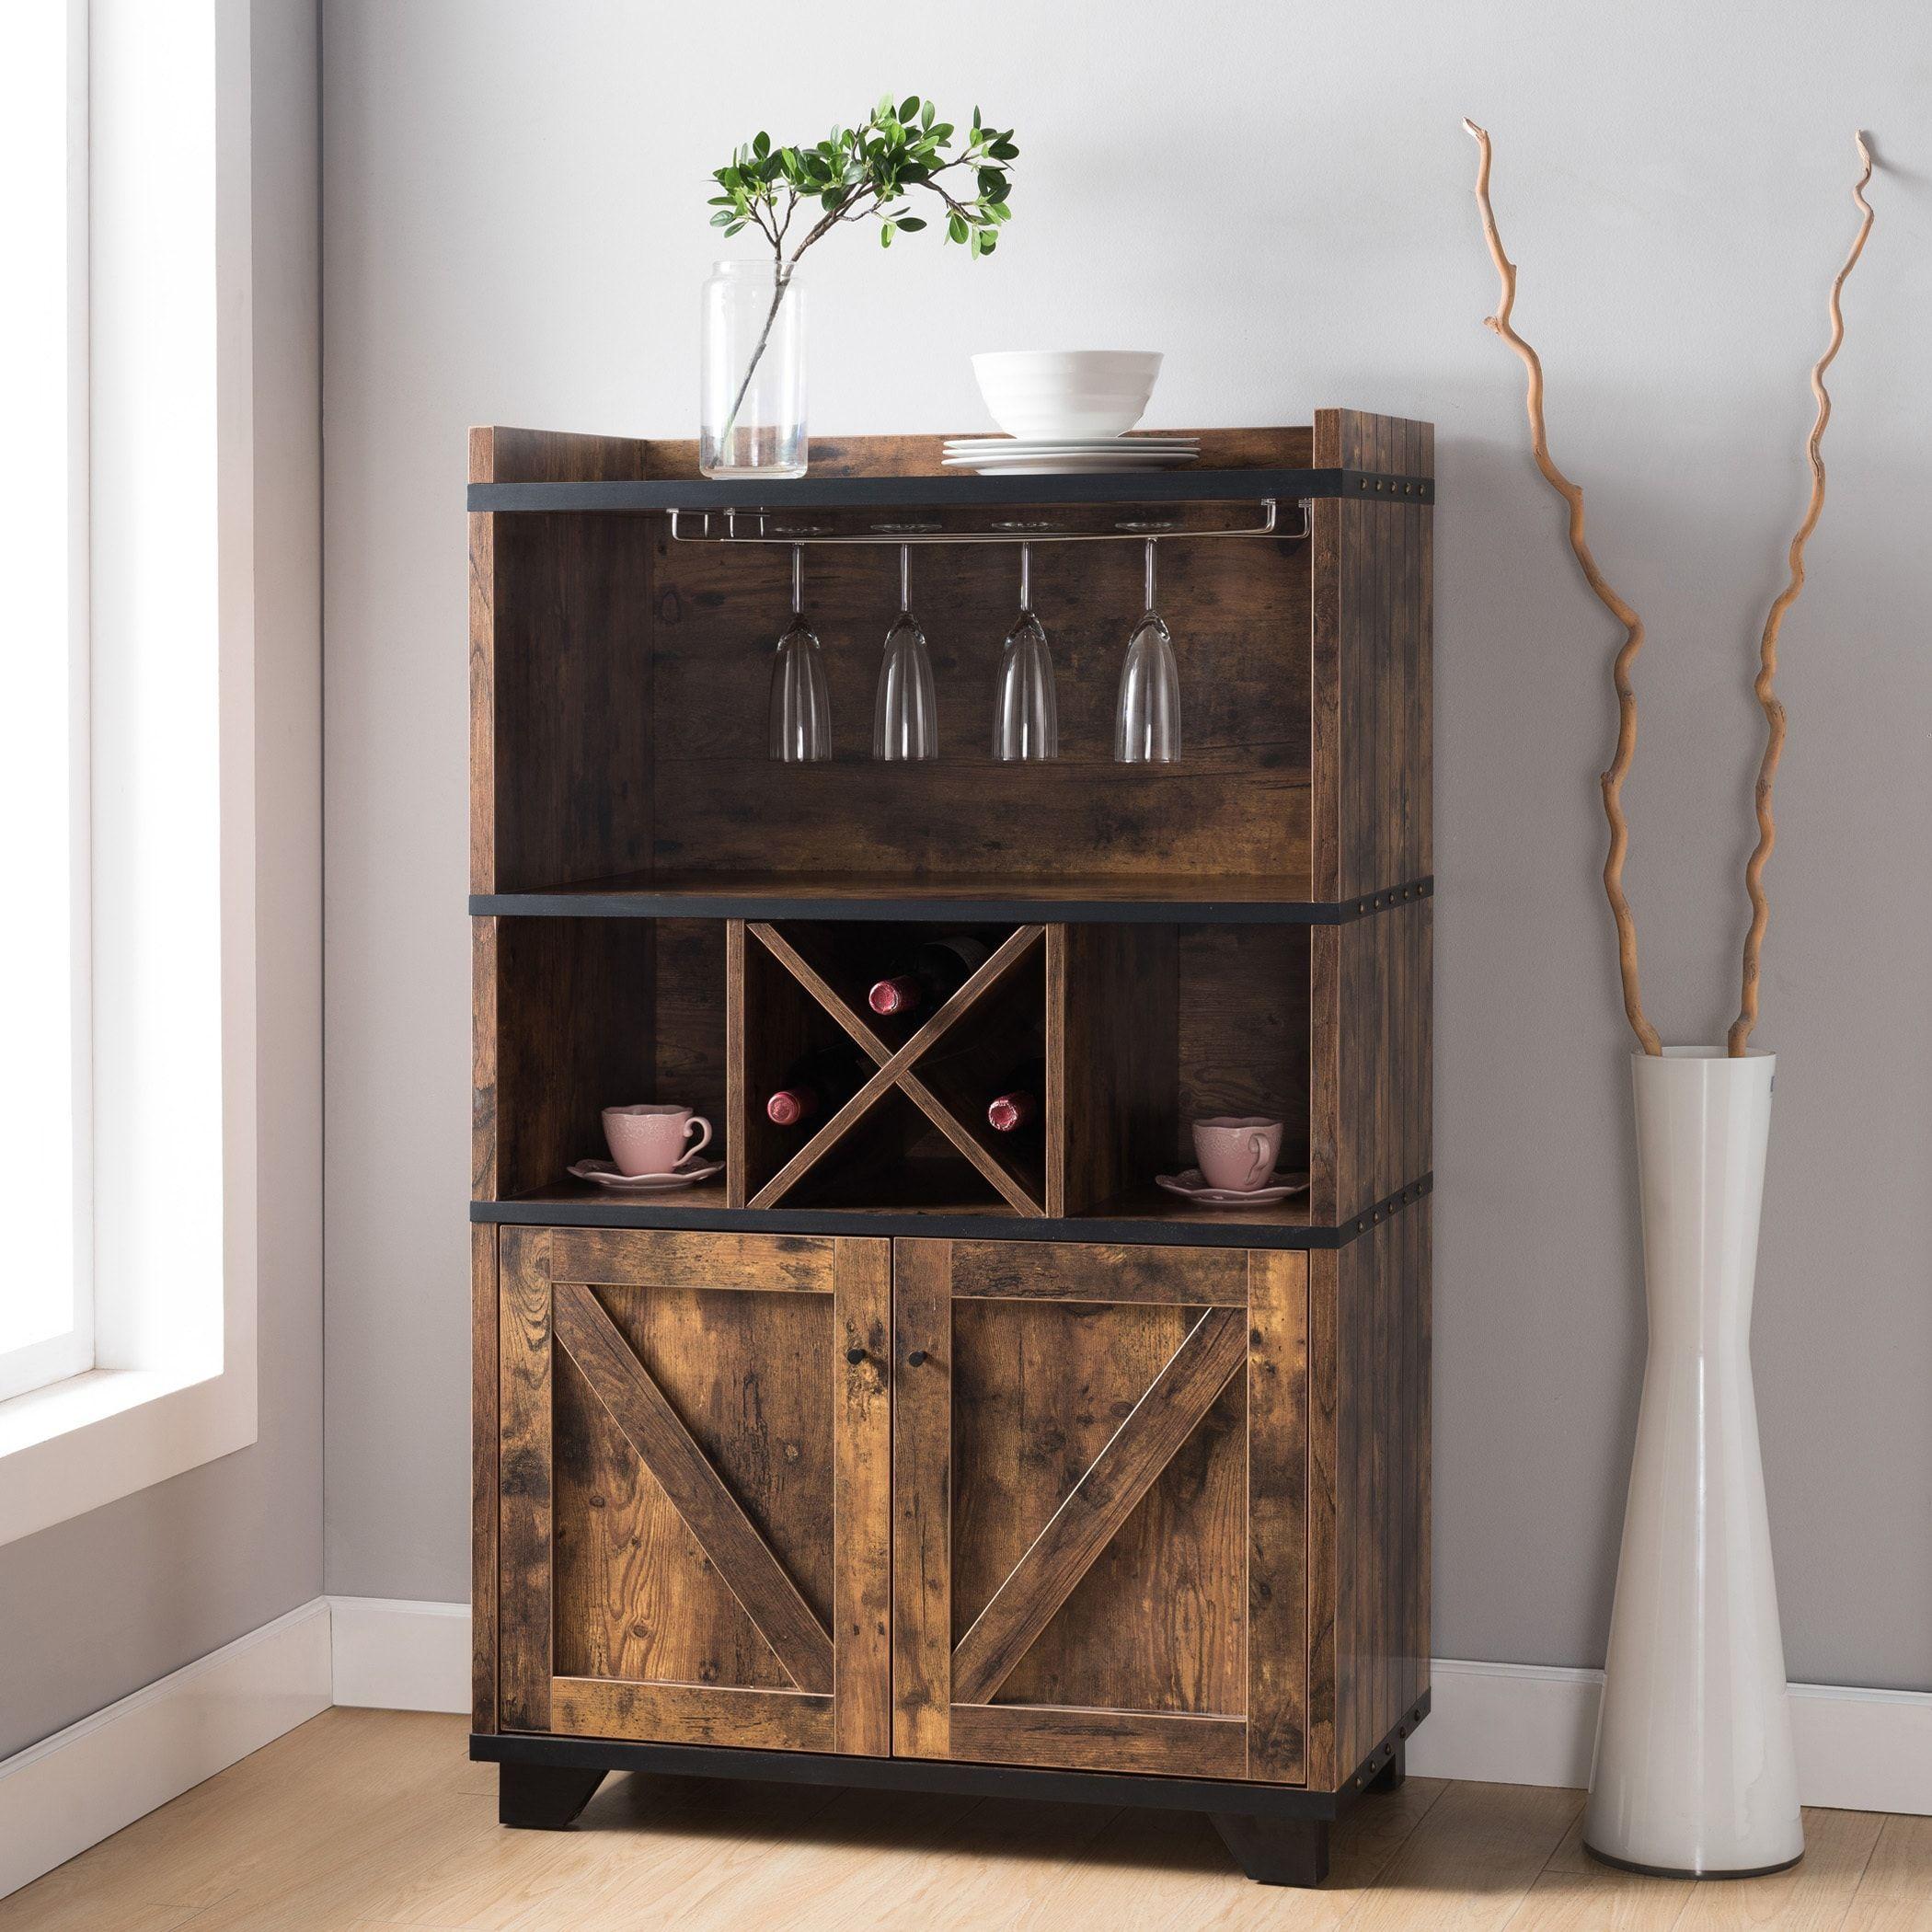 Furniture Of America Keya Farmhouse 31 Inch Wine Cabinet Buffet Wine Cabinets Rustic Wine Cabinet Bar Furniture